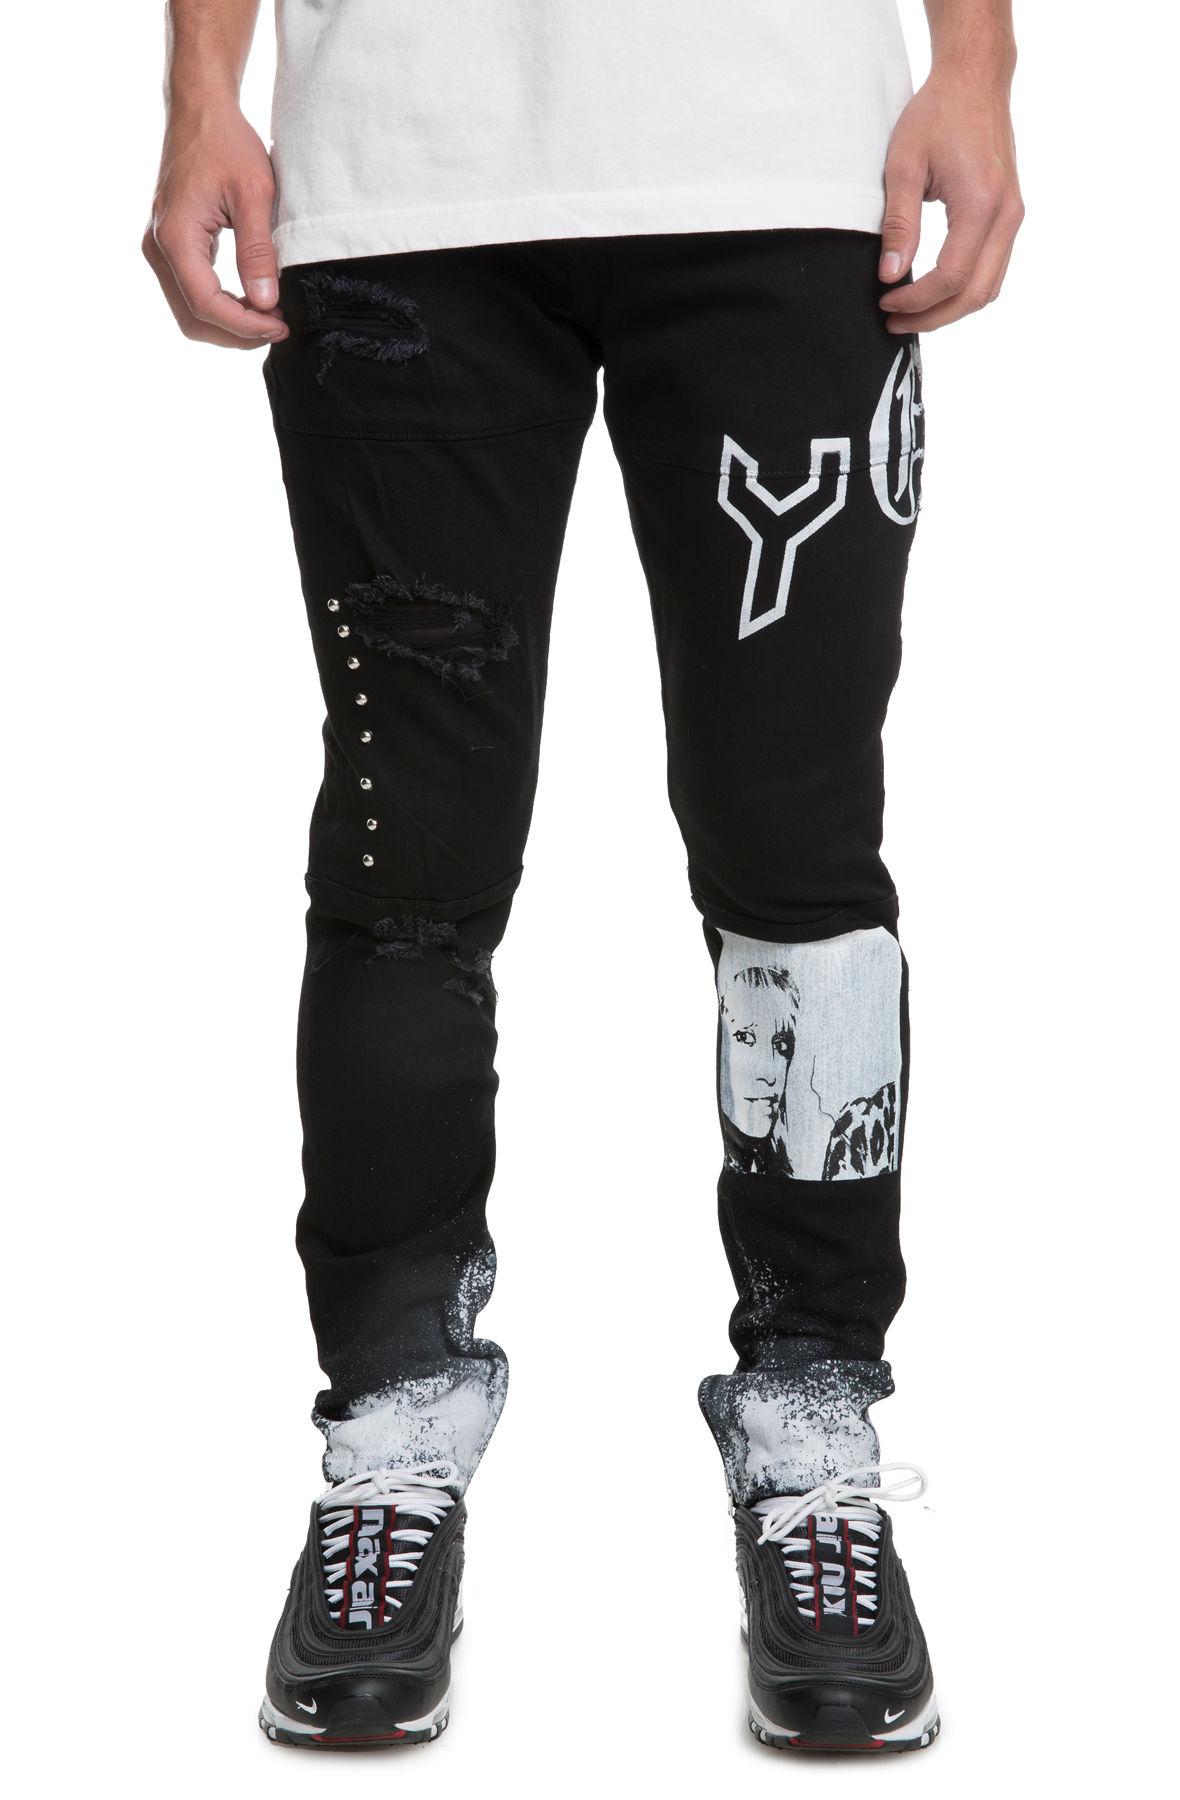 Image of The Spungen Pants in Black